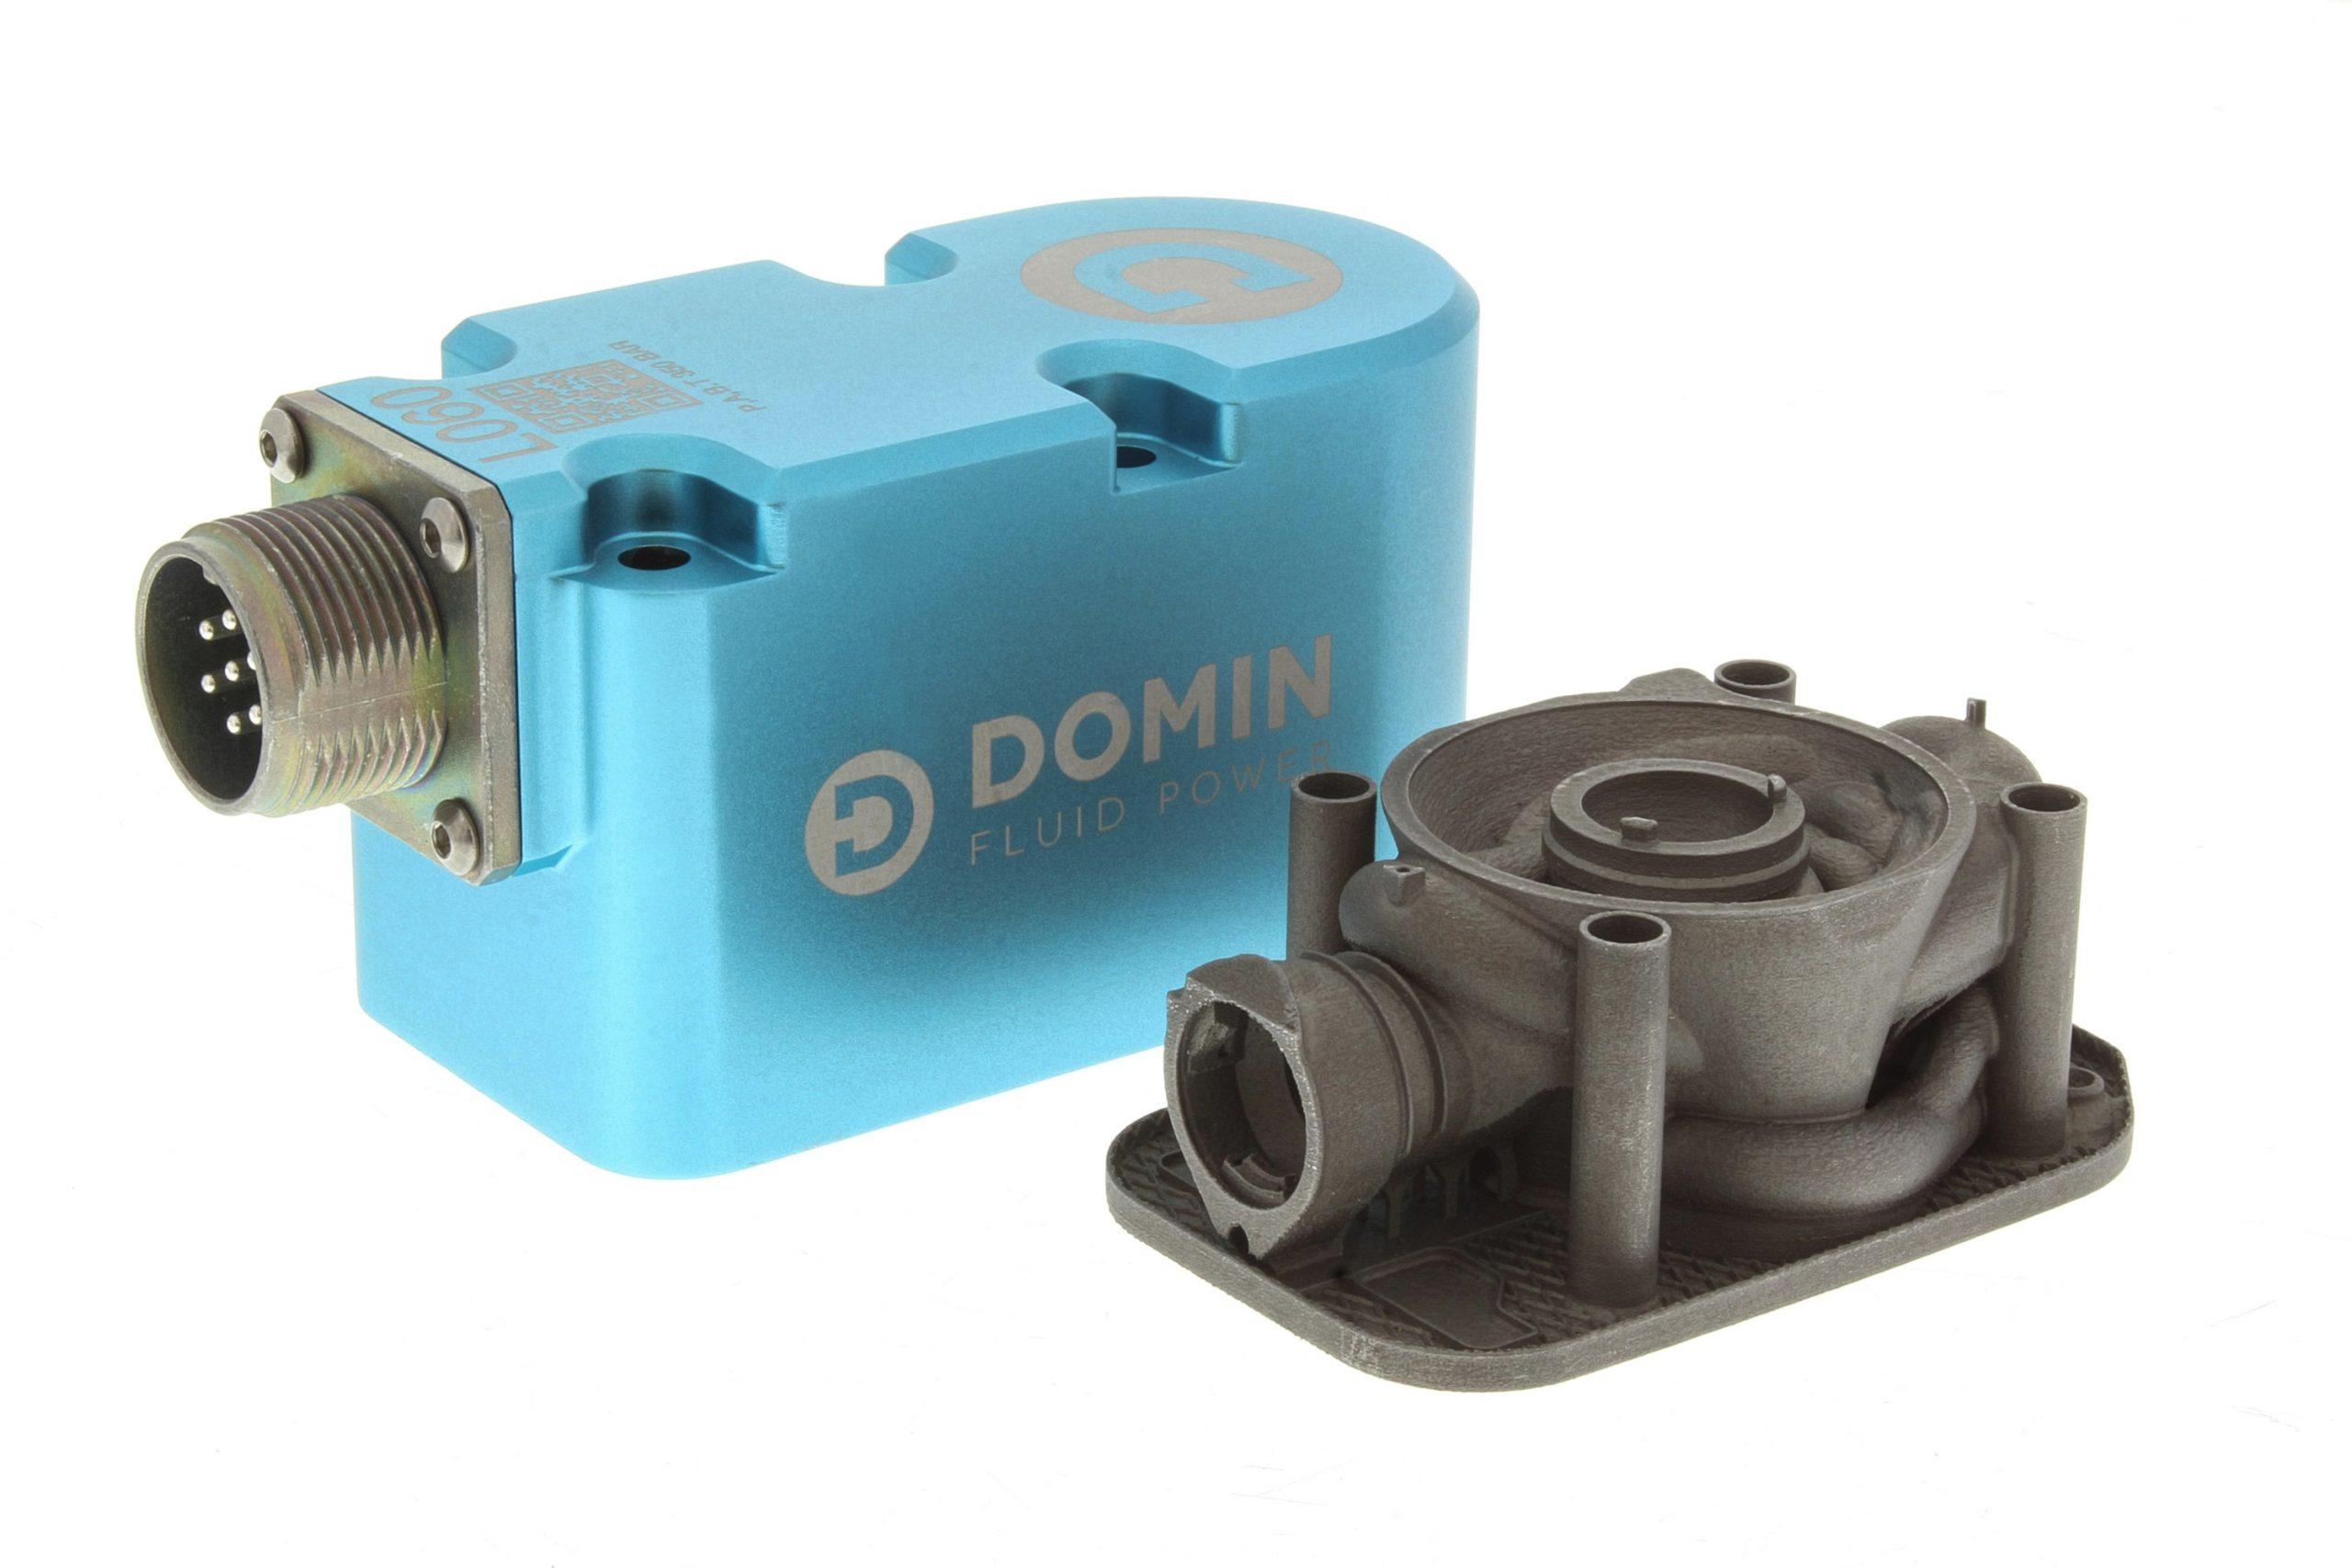 Domin's 3D printed ultra compact direct drive servo valves. Photo via Renishaw.